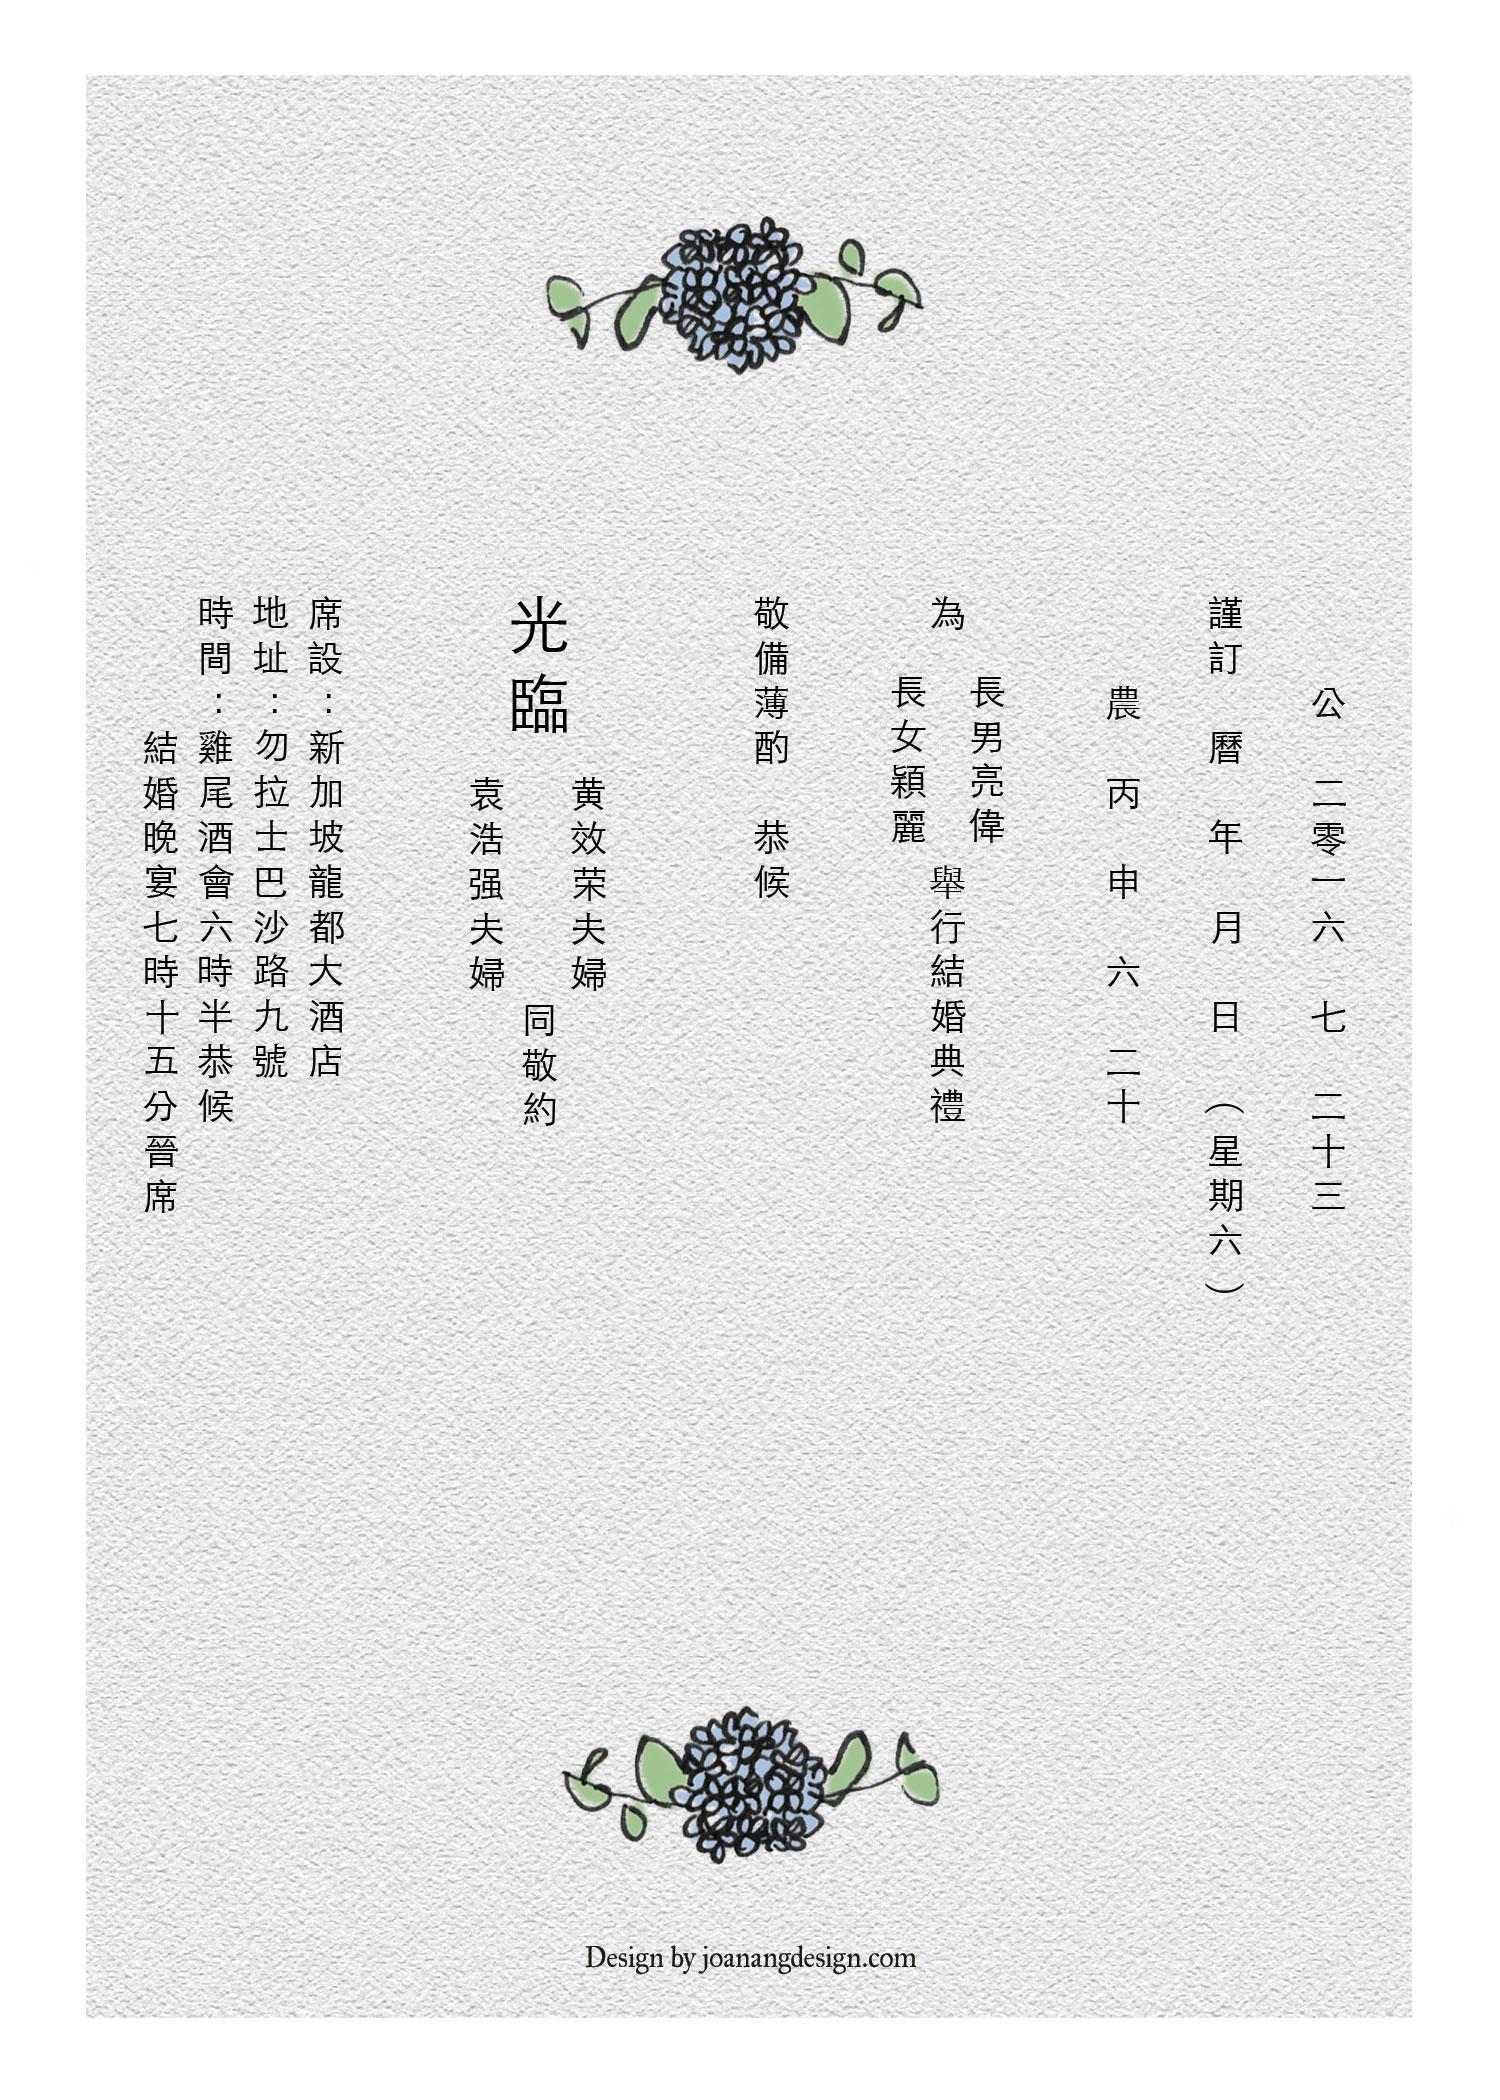 liangster-wedding-invite-chinese-02.jpg